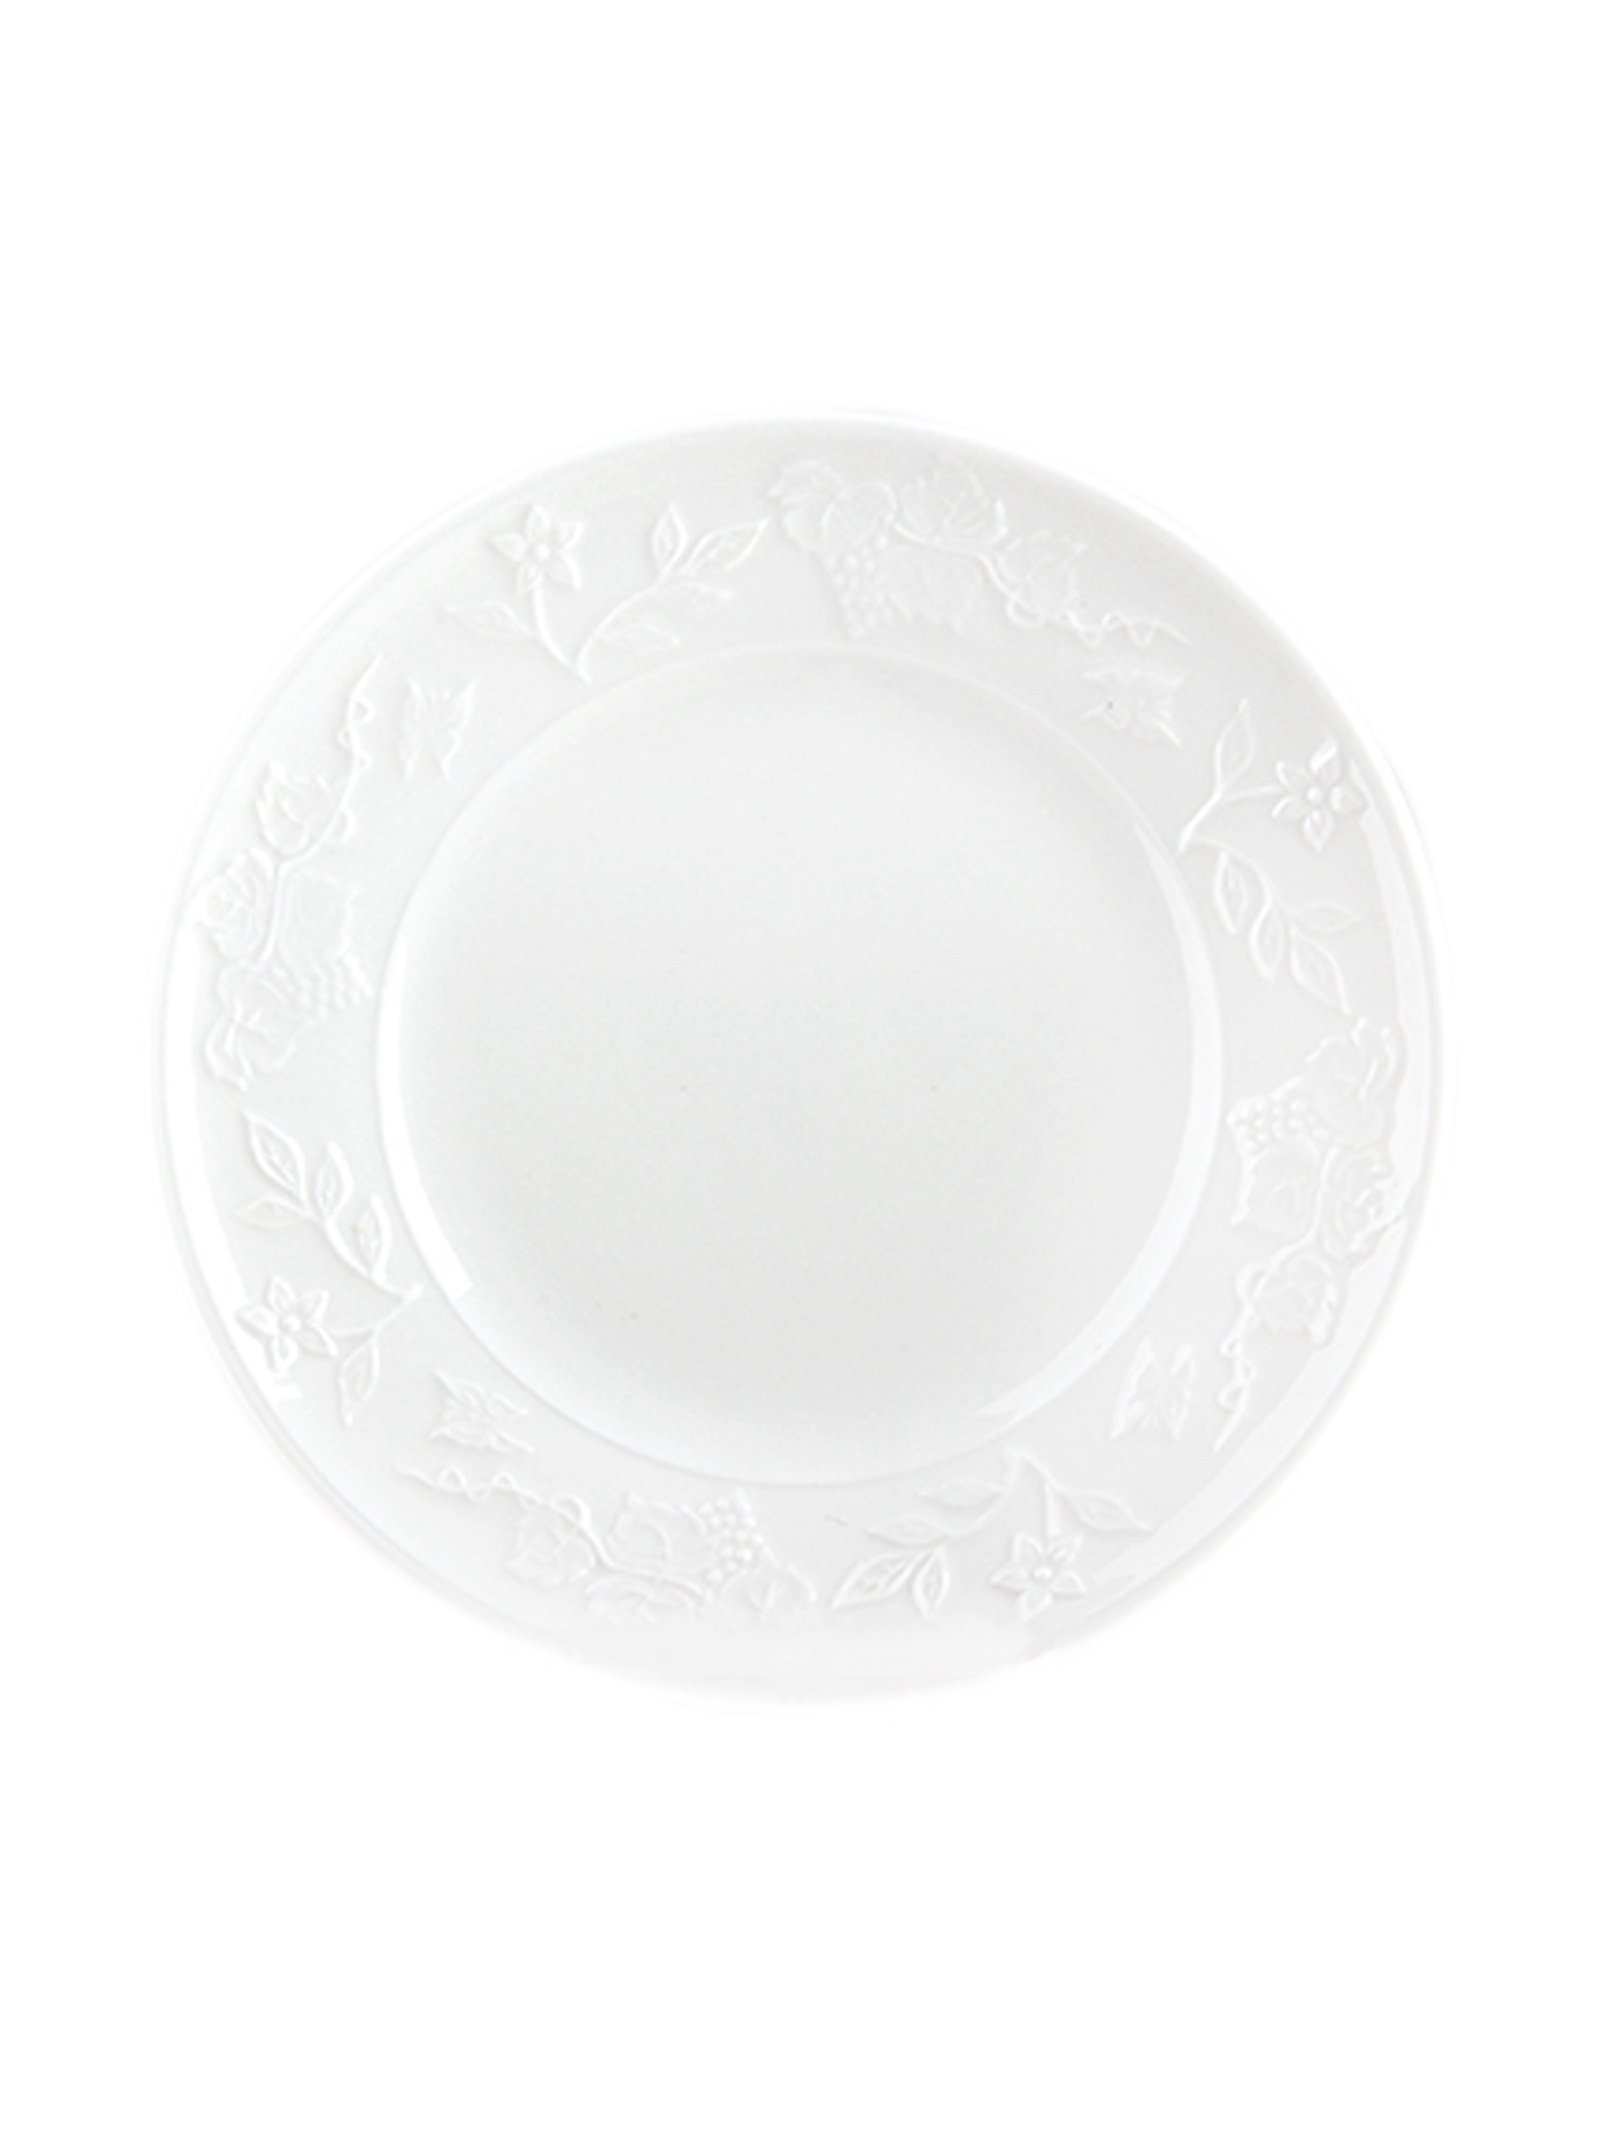 Тарелка десертная Коралл 917197, Керамика тарелка десертная ломоносовская керамика диаметр 21 см